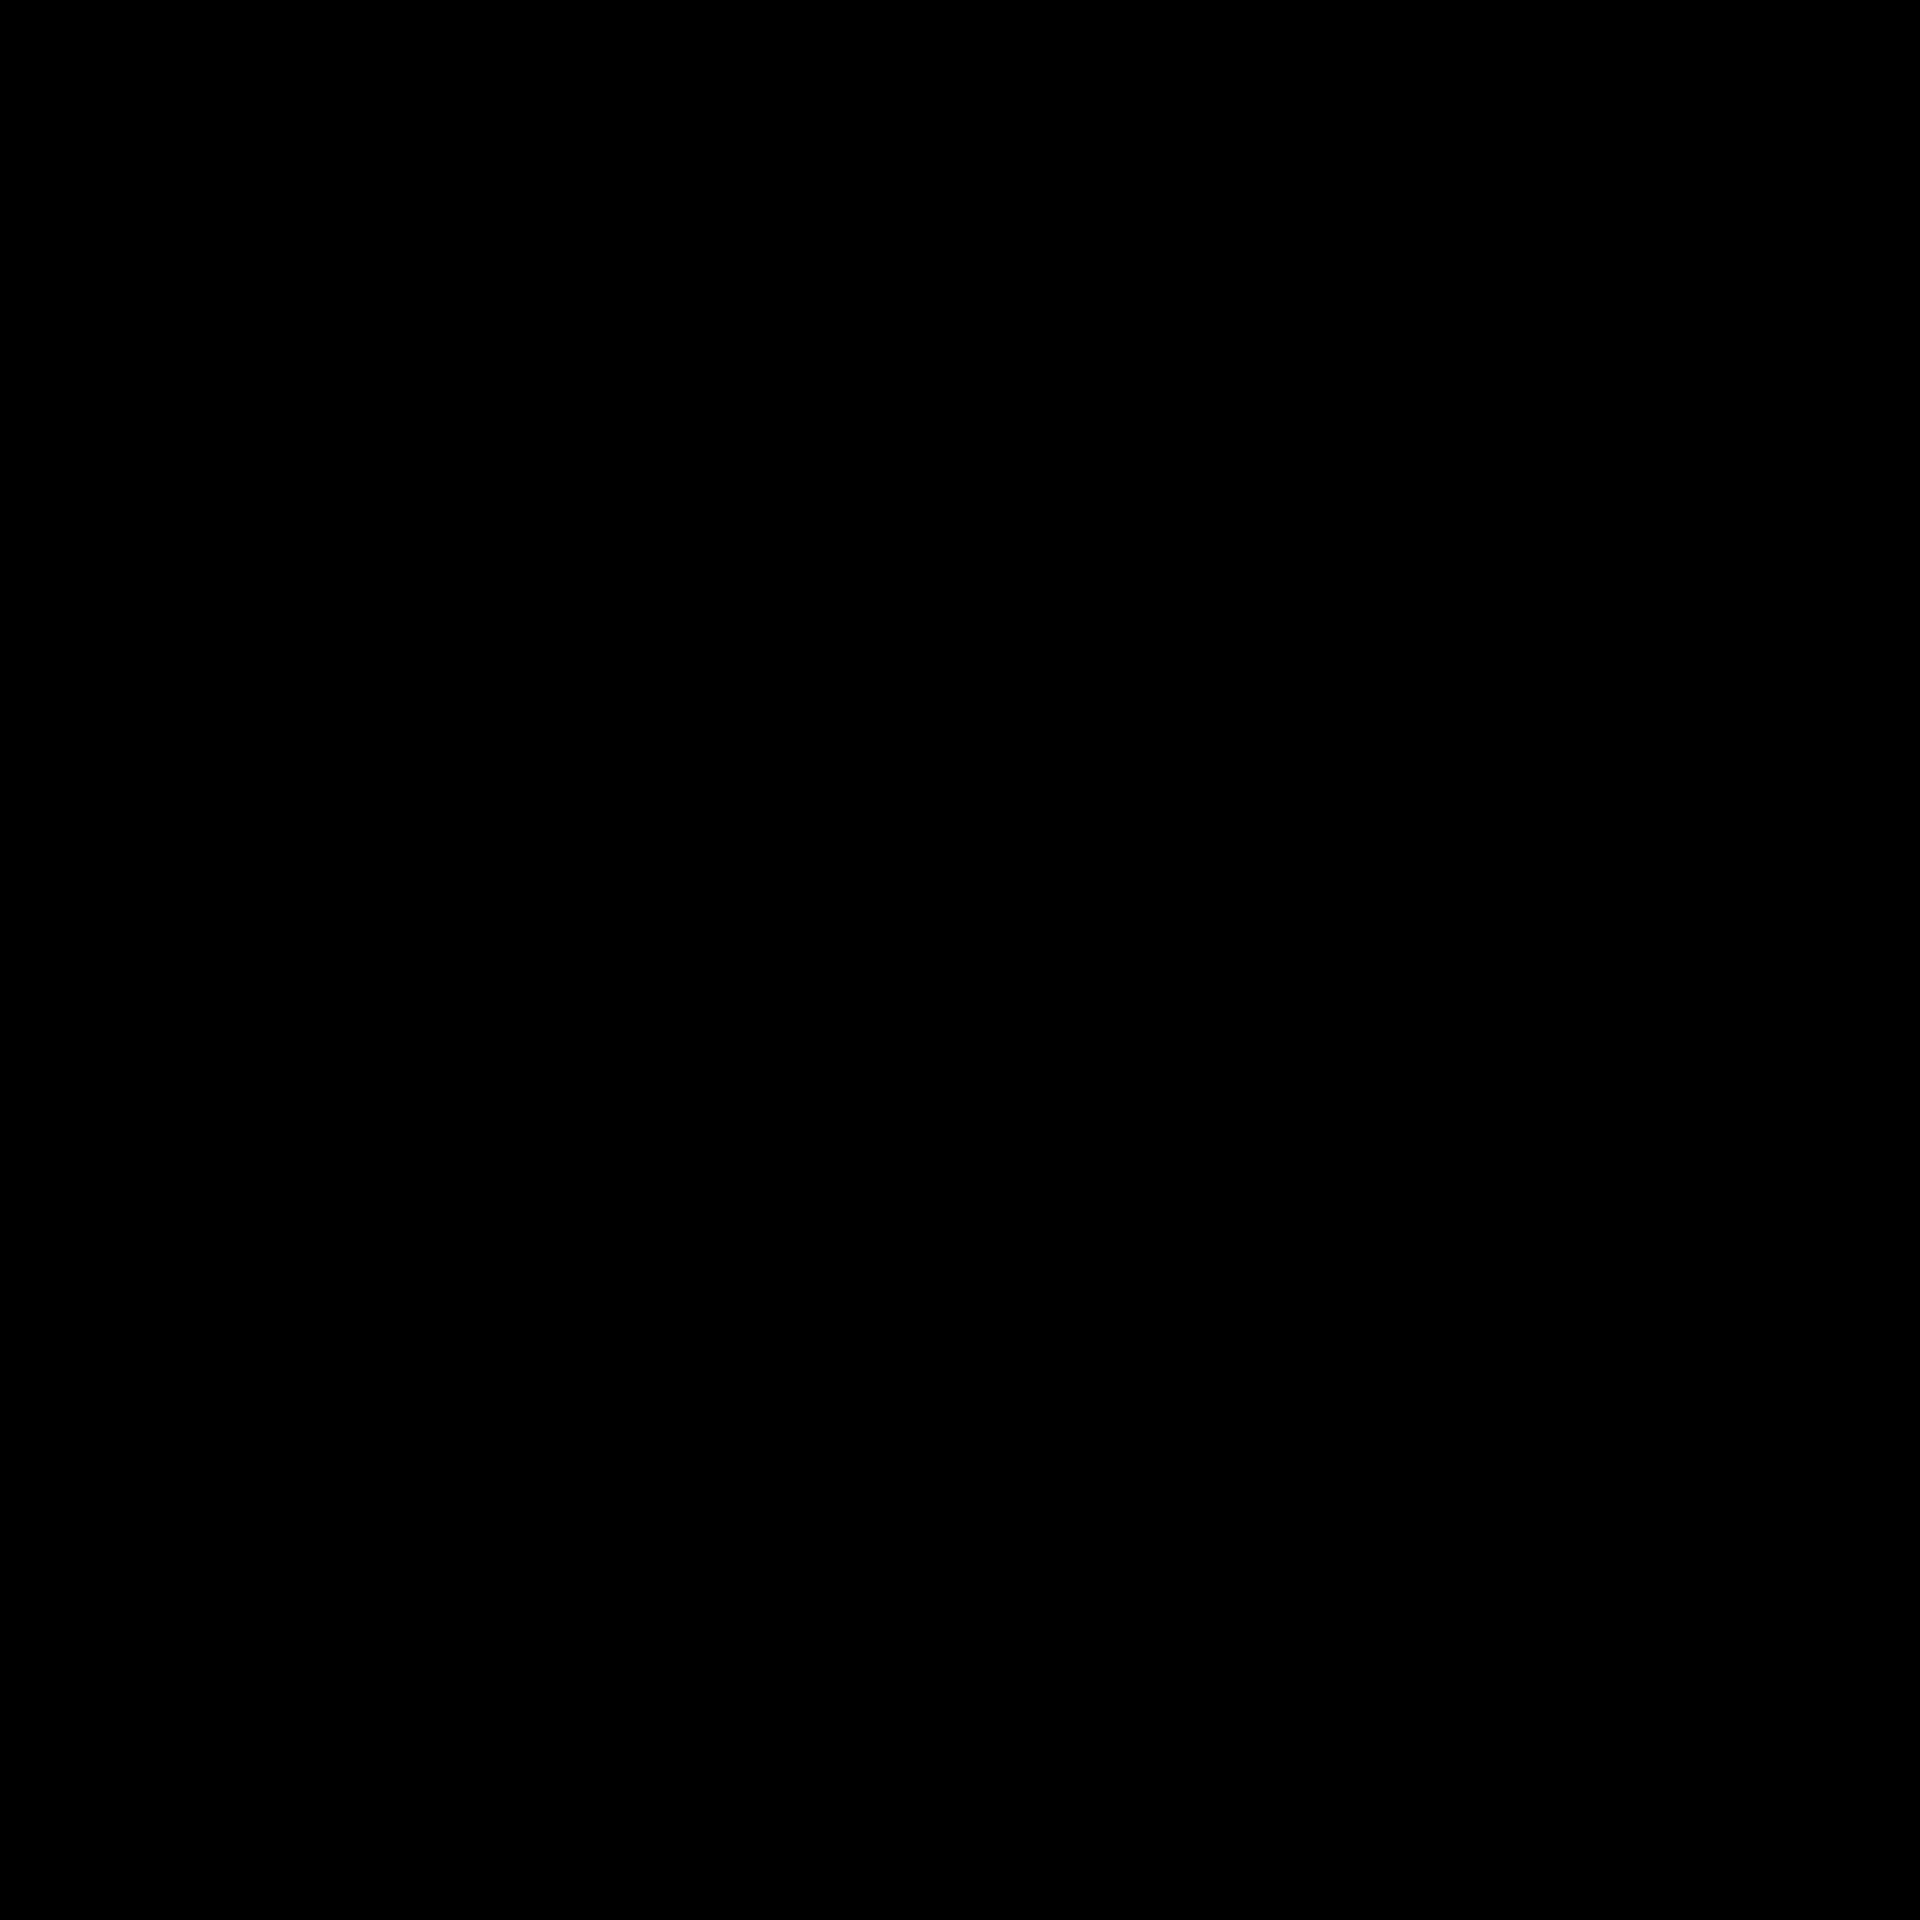 hook-2470296_1920.png